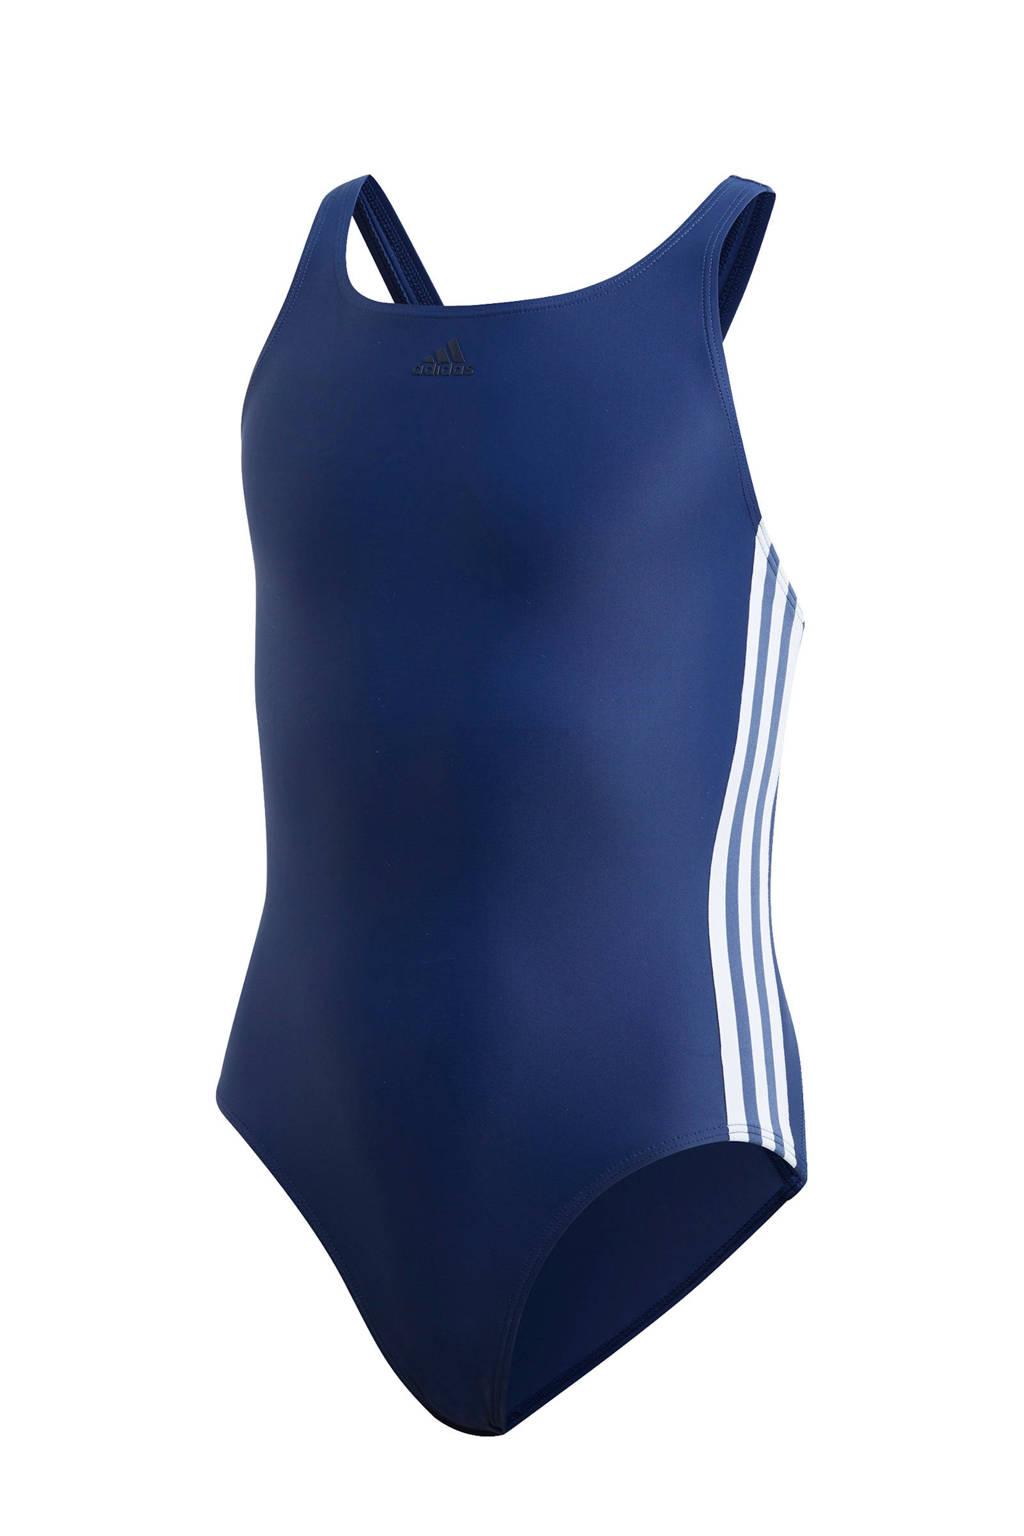 adidas Performance sportbadpak donkerblauw/wit, Donkerblauw/wit